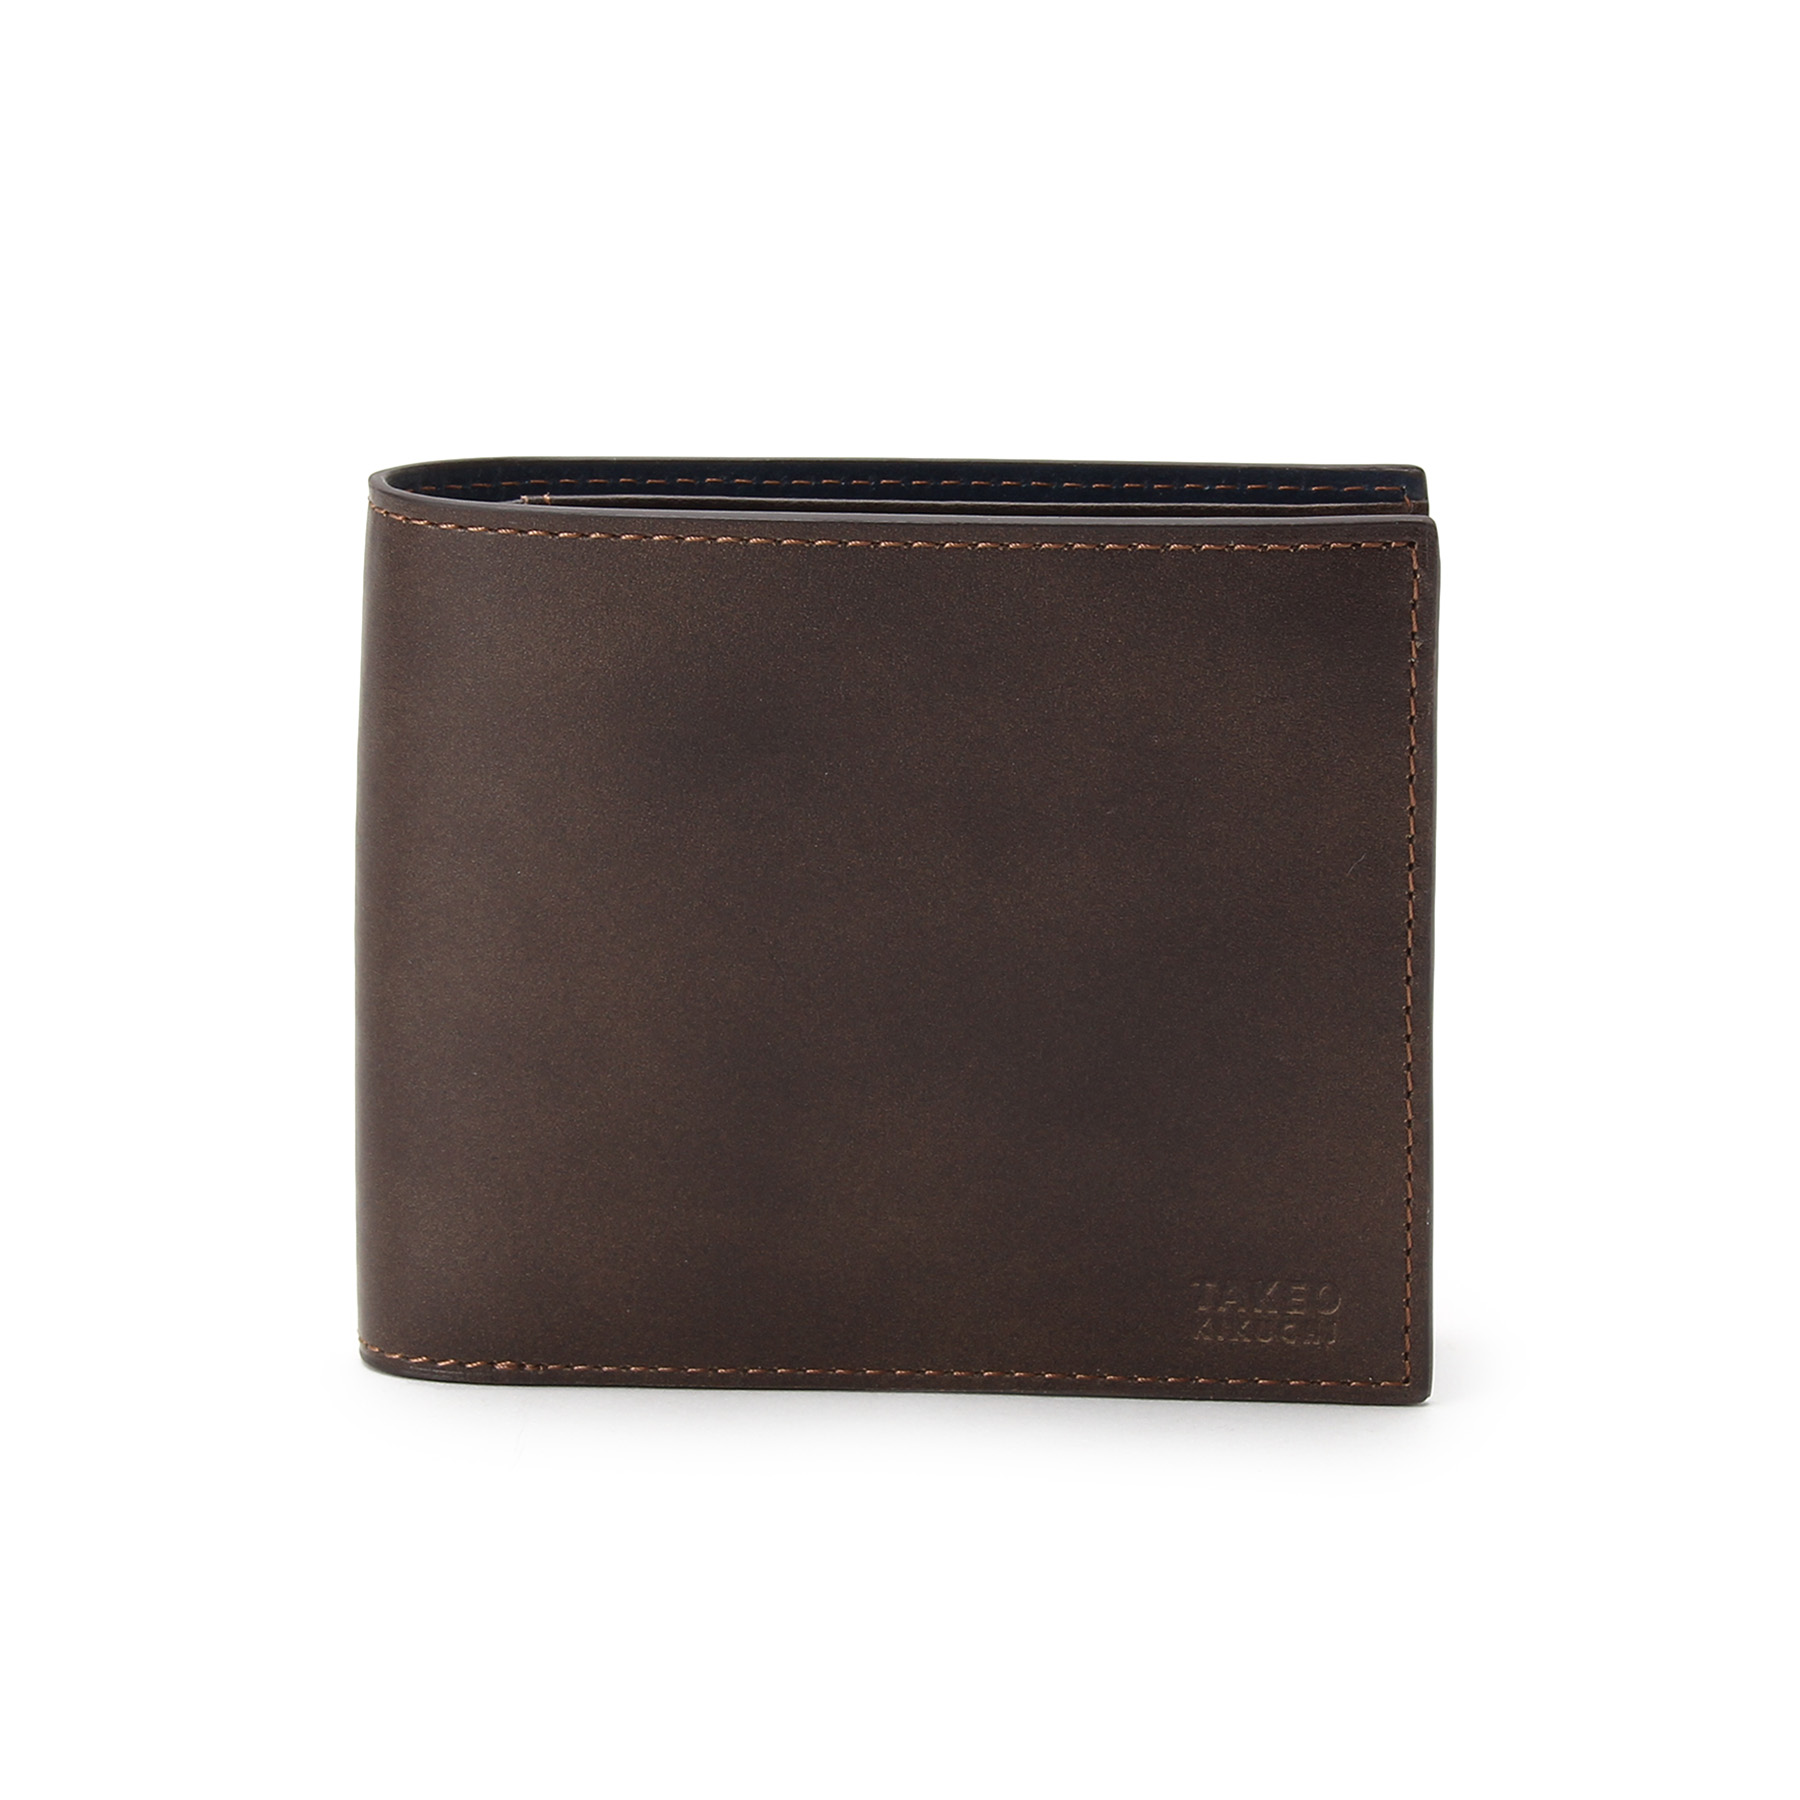 TAKEO KIKUCHI (タケオキクチ) Tアンティーク二つ折り財布